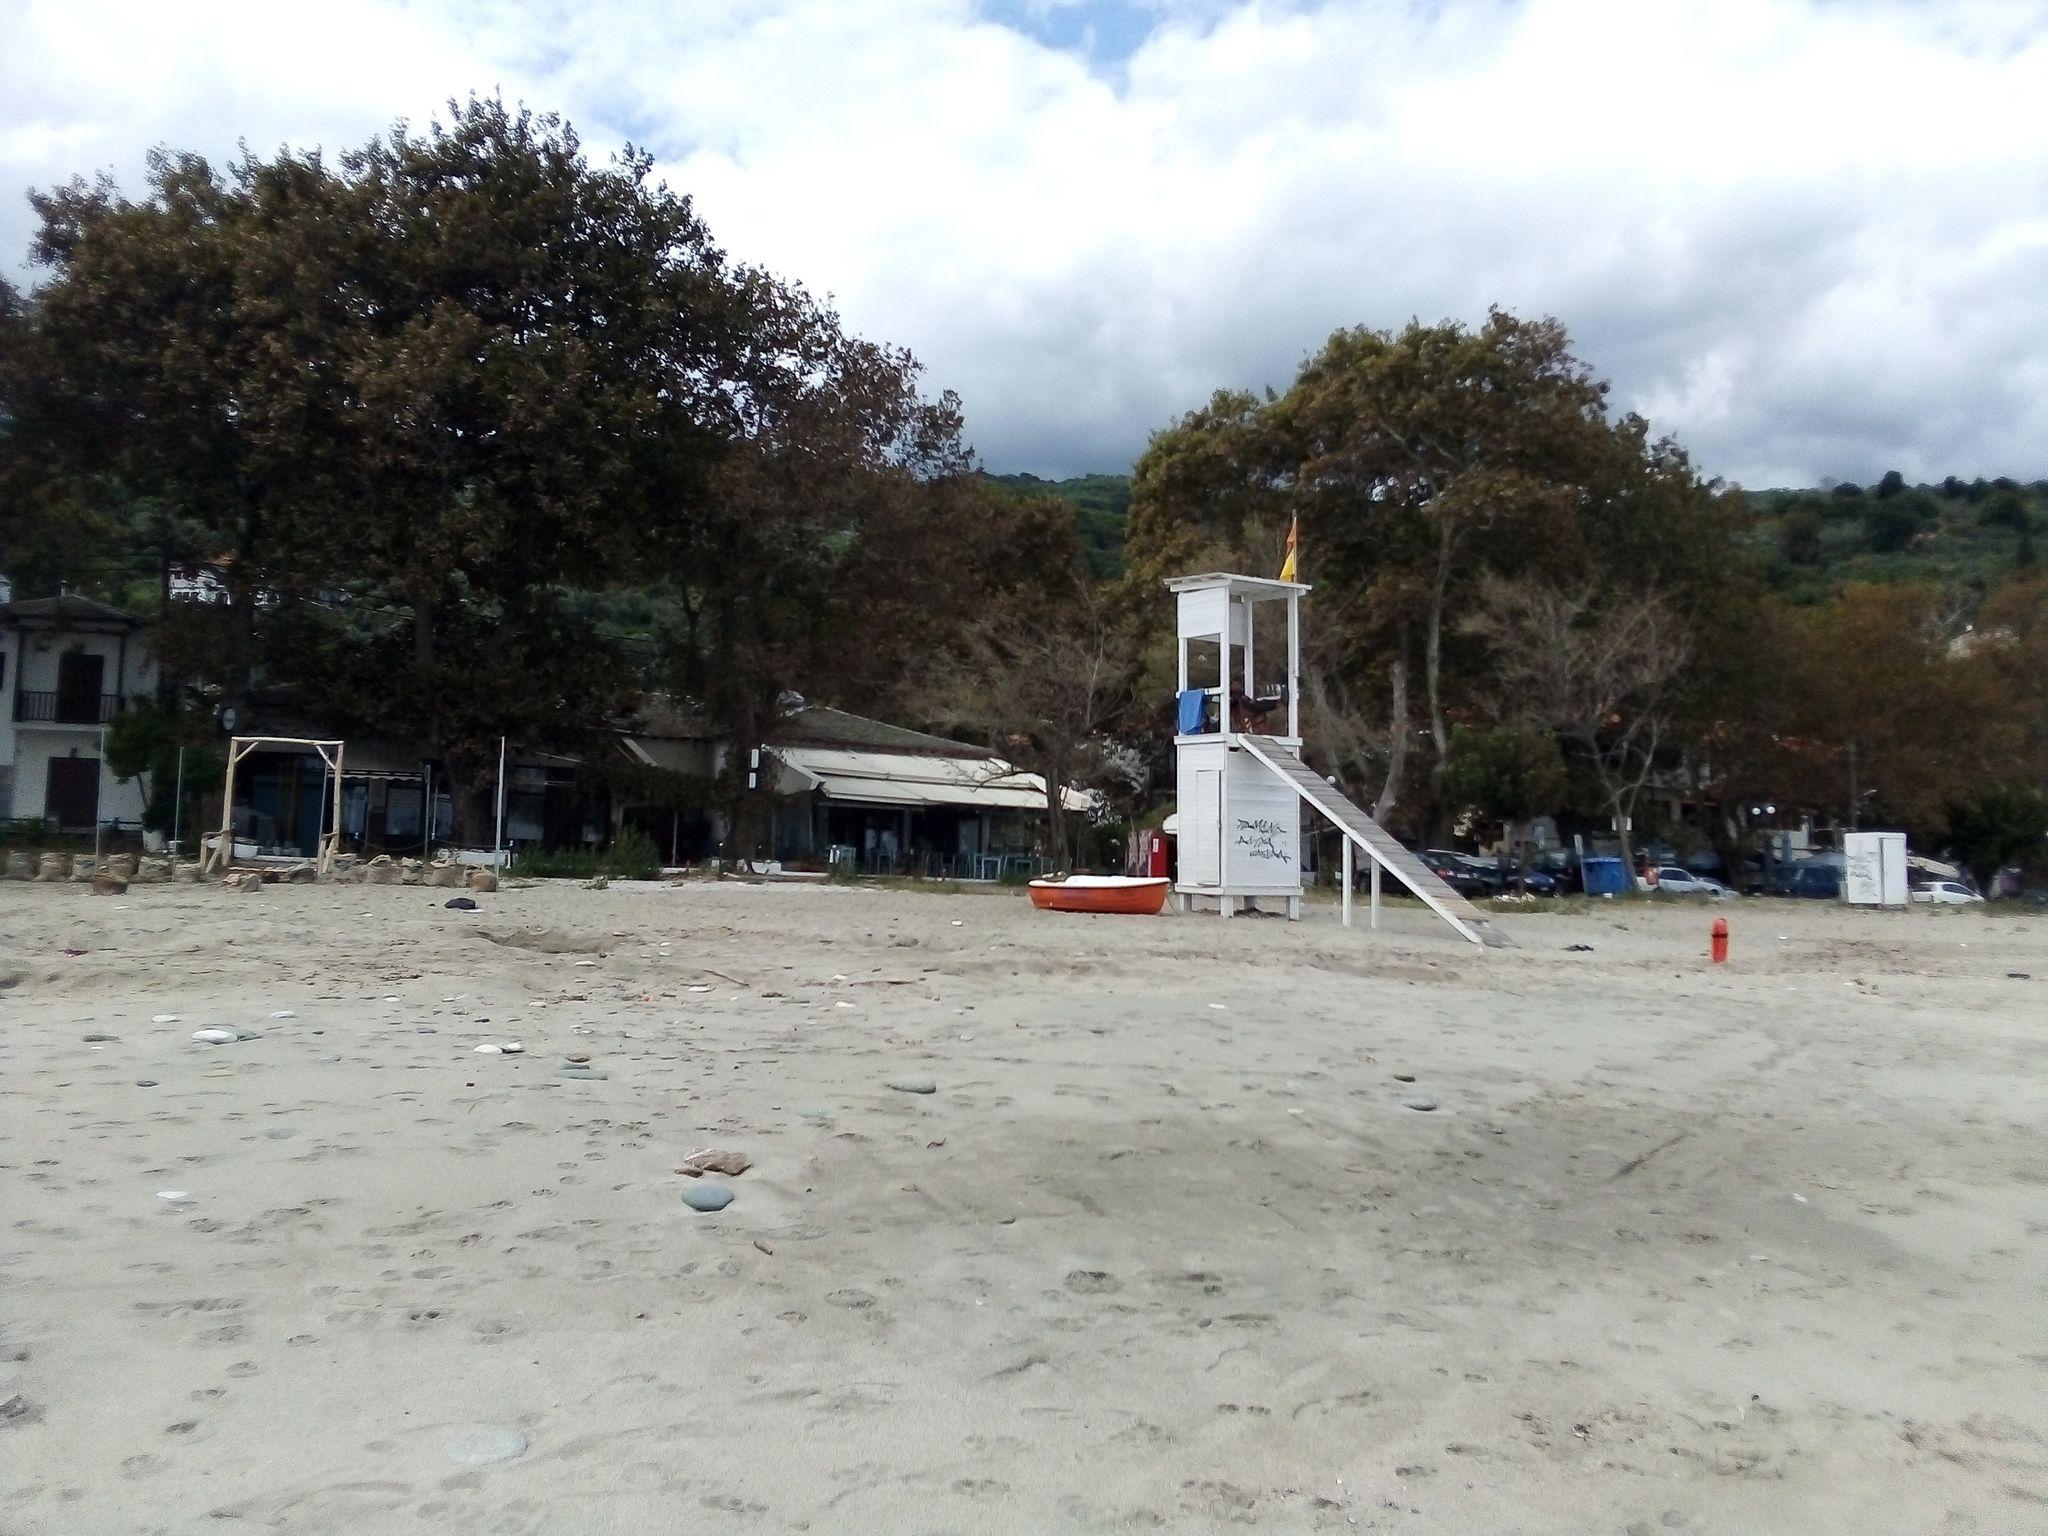 бутка на спасител на плаж Хоревто